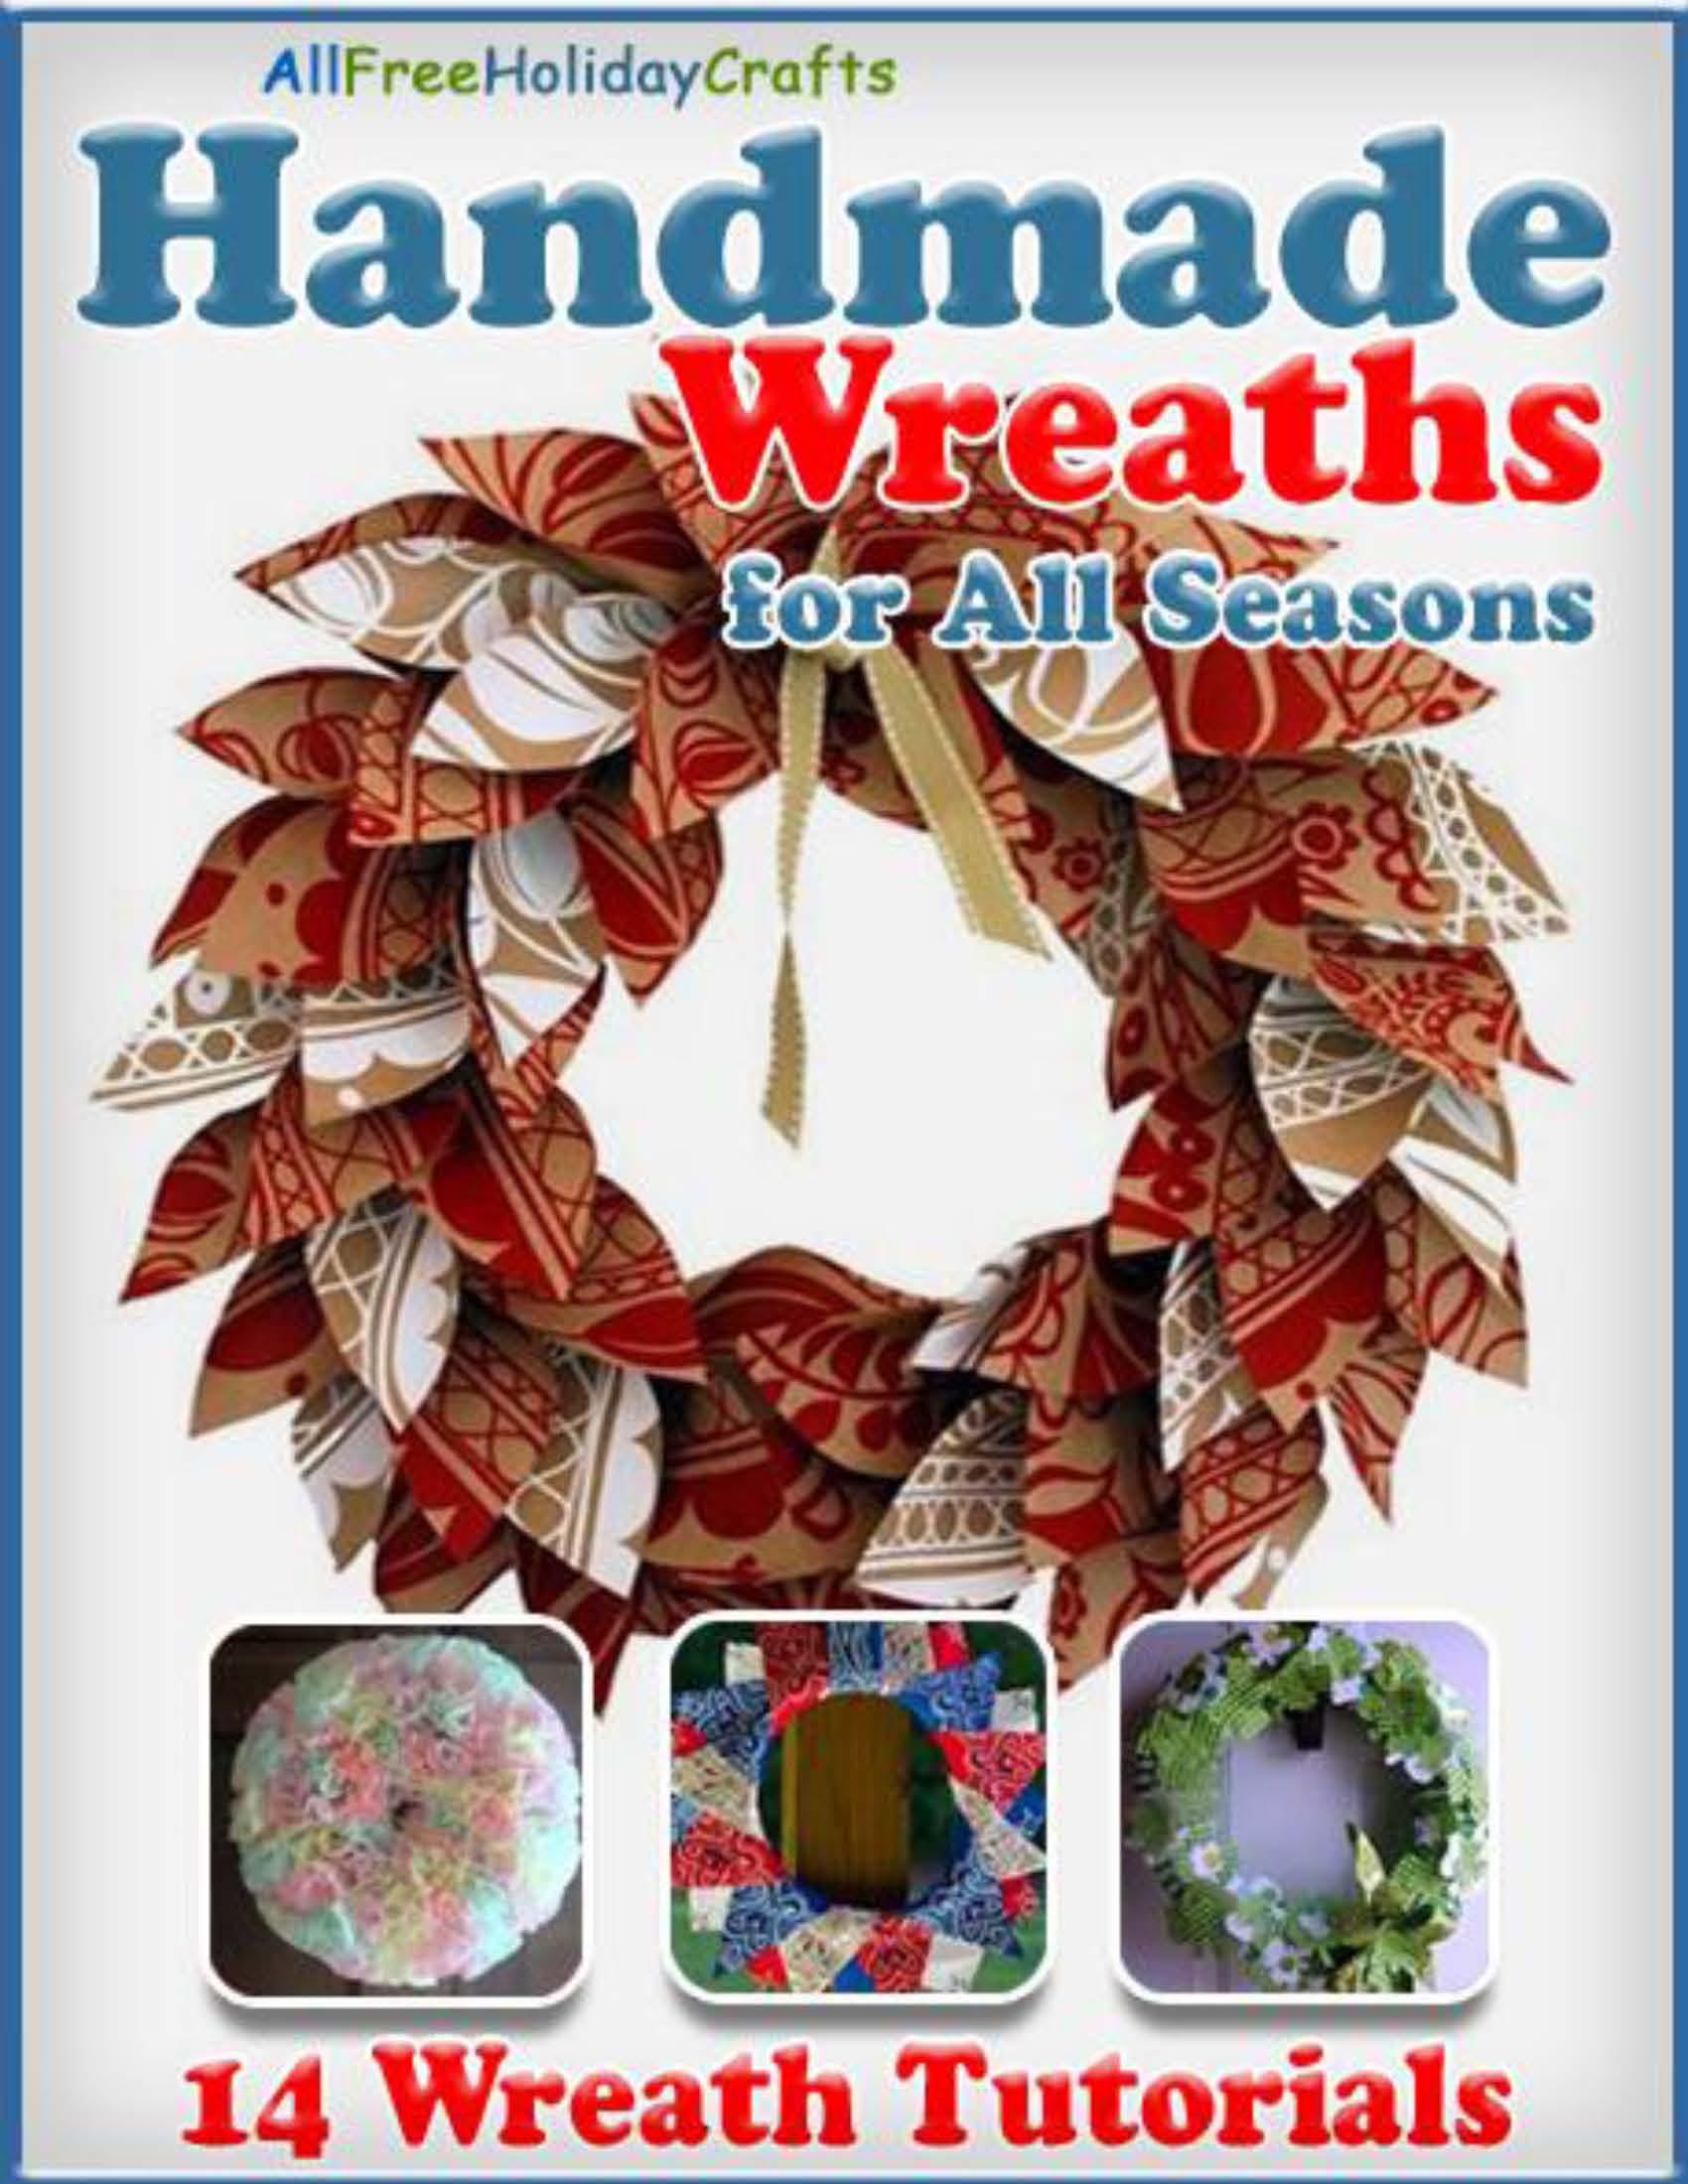 4th of July door wreath tutorial with scrap fabric